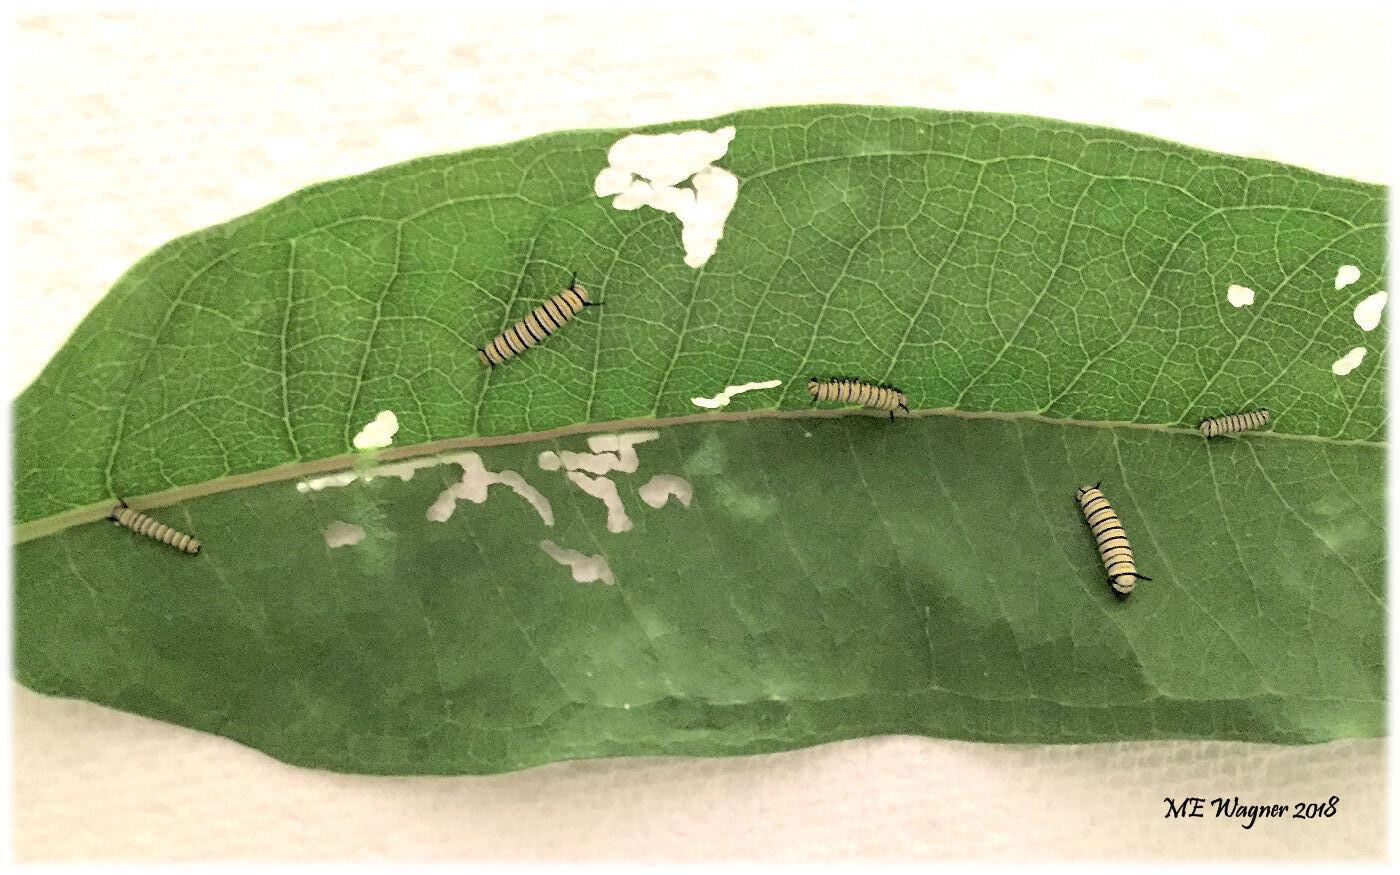 1st and 2nd instar monarch,  Danaus plexippus,  caterpillars being raised indoors feeding on common milkweed,  Asclepais syriaca .    Photograph courtesy of Mary Ann Wagner